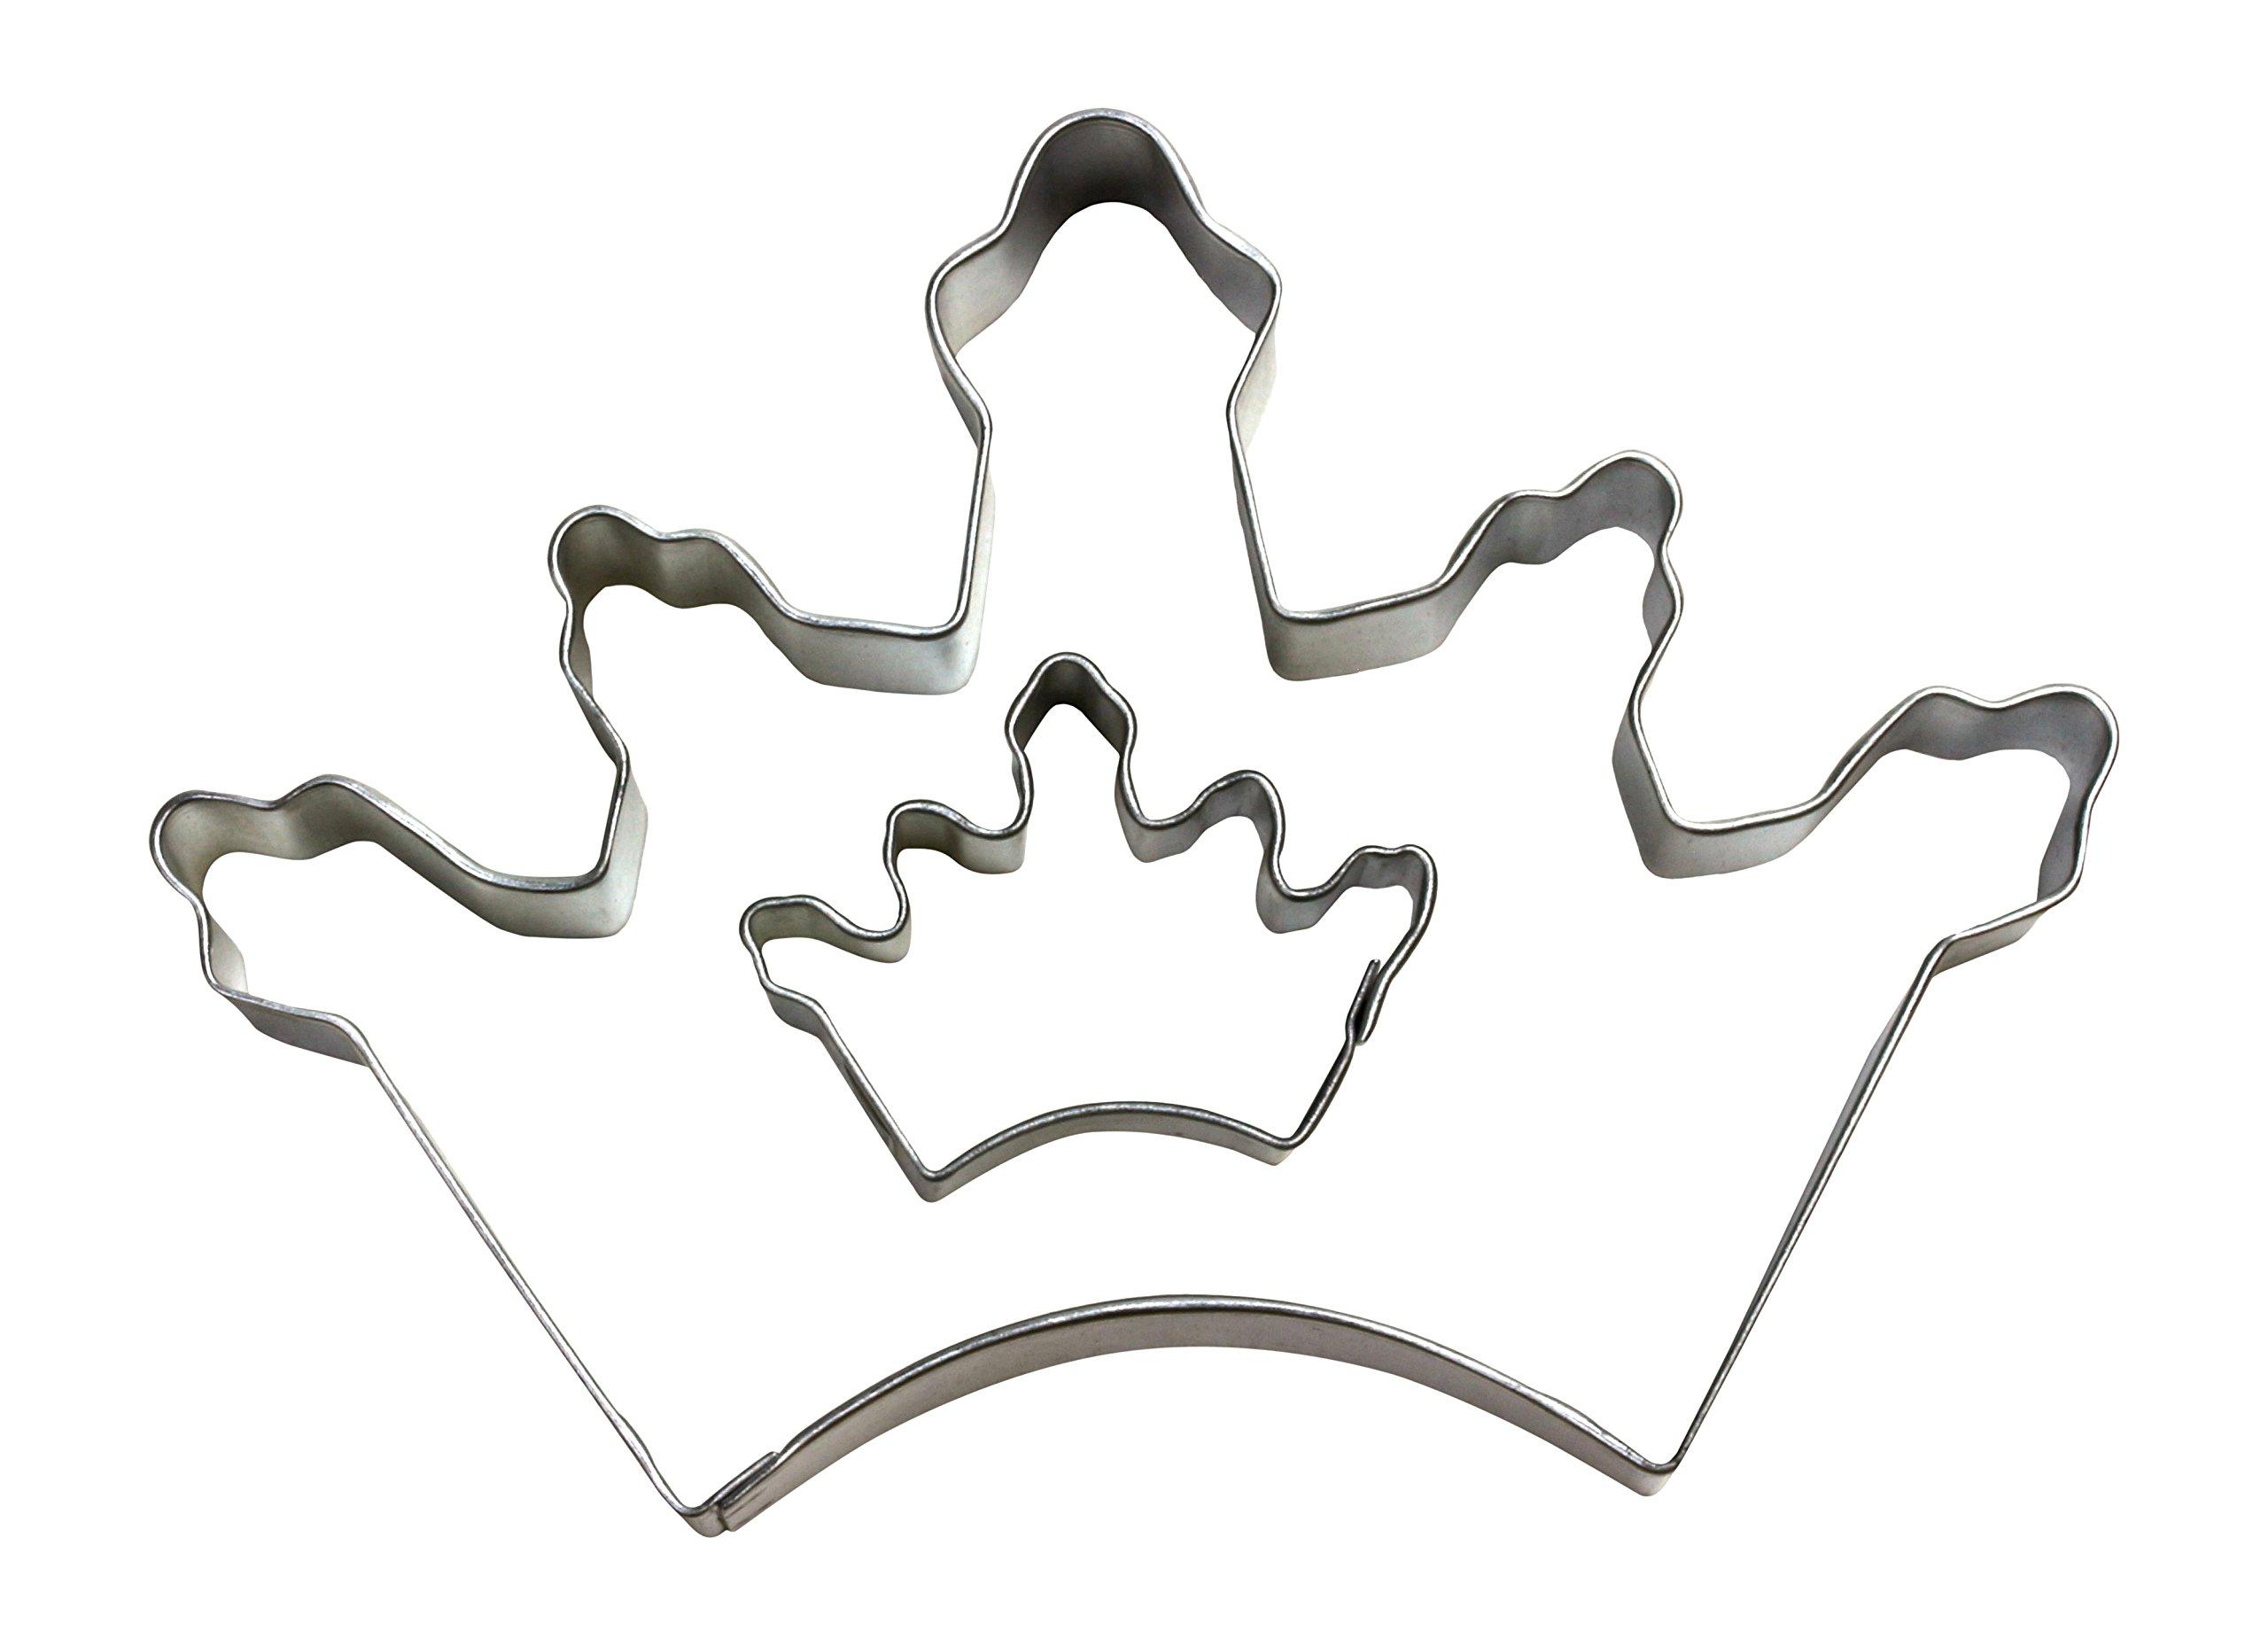 Cybrtrayd Parent/Child Cookie Cutter Set, 5-Inch, Crown